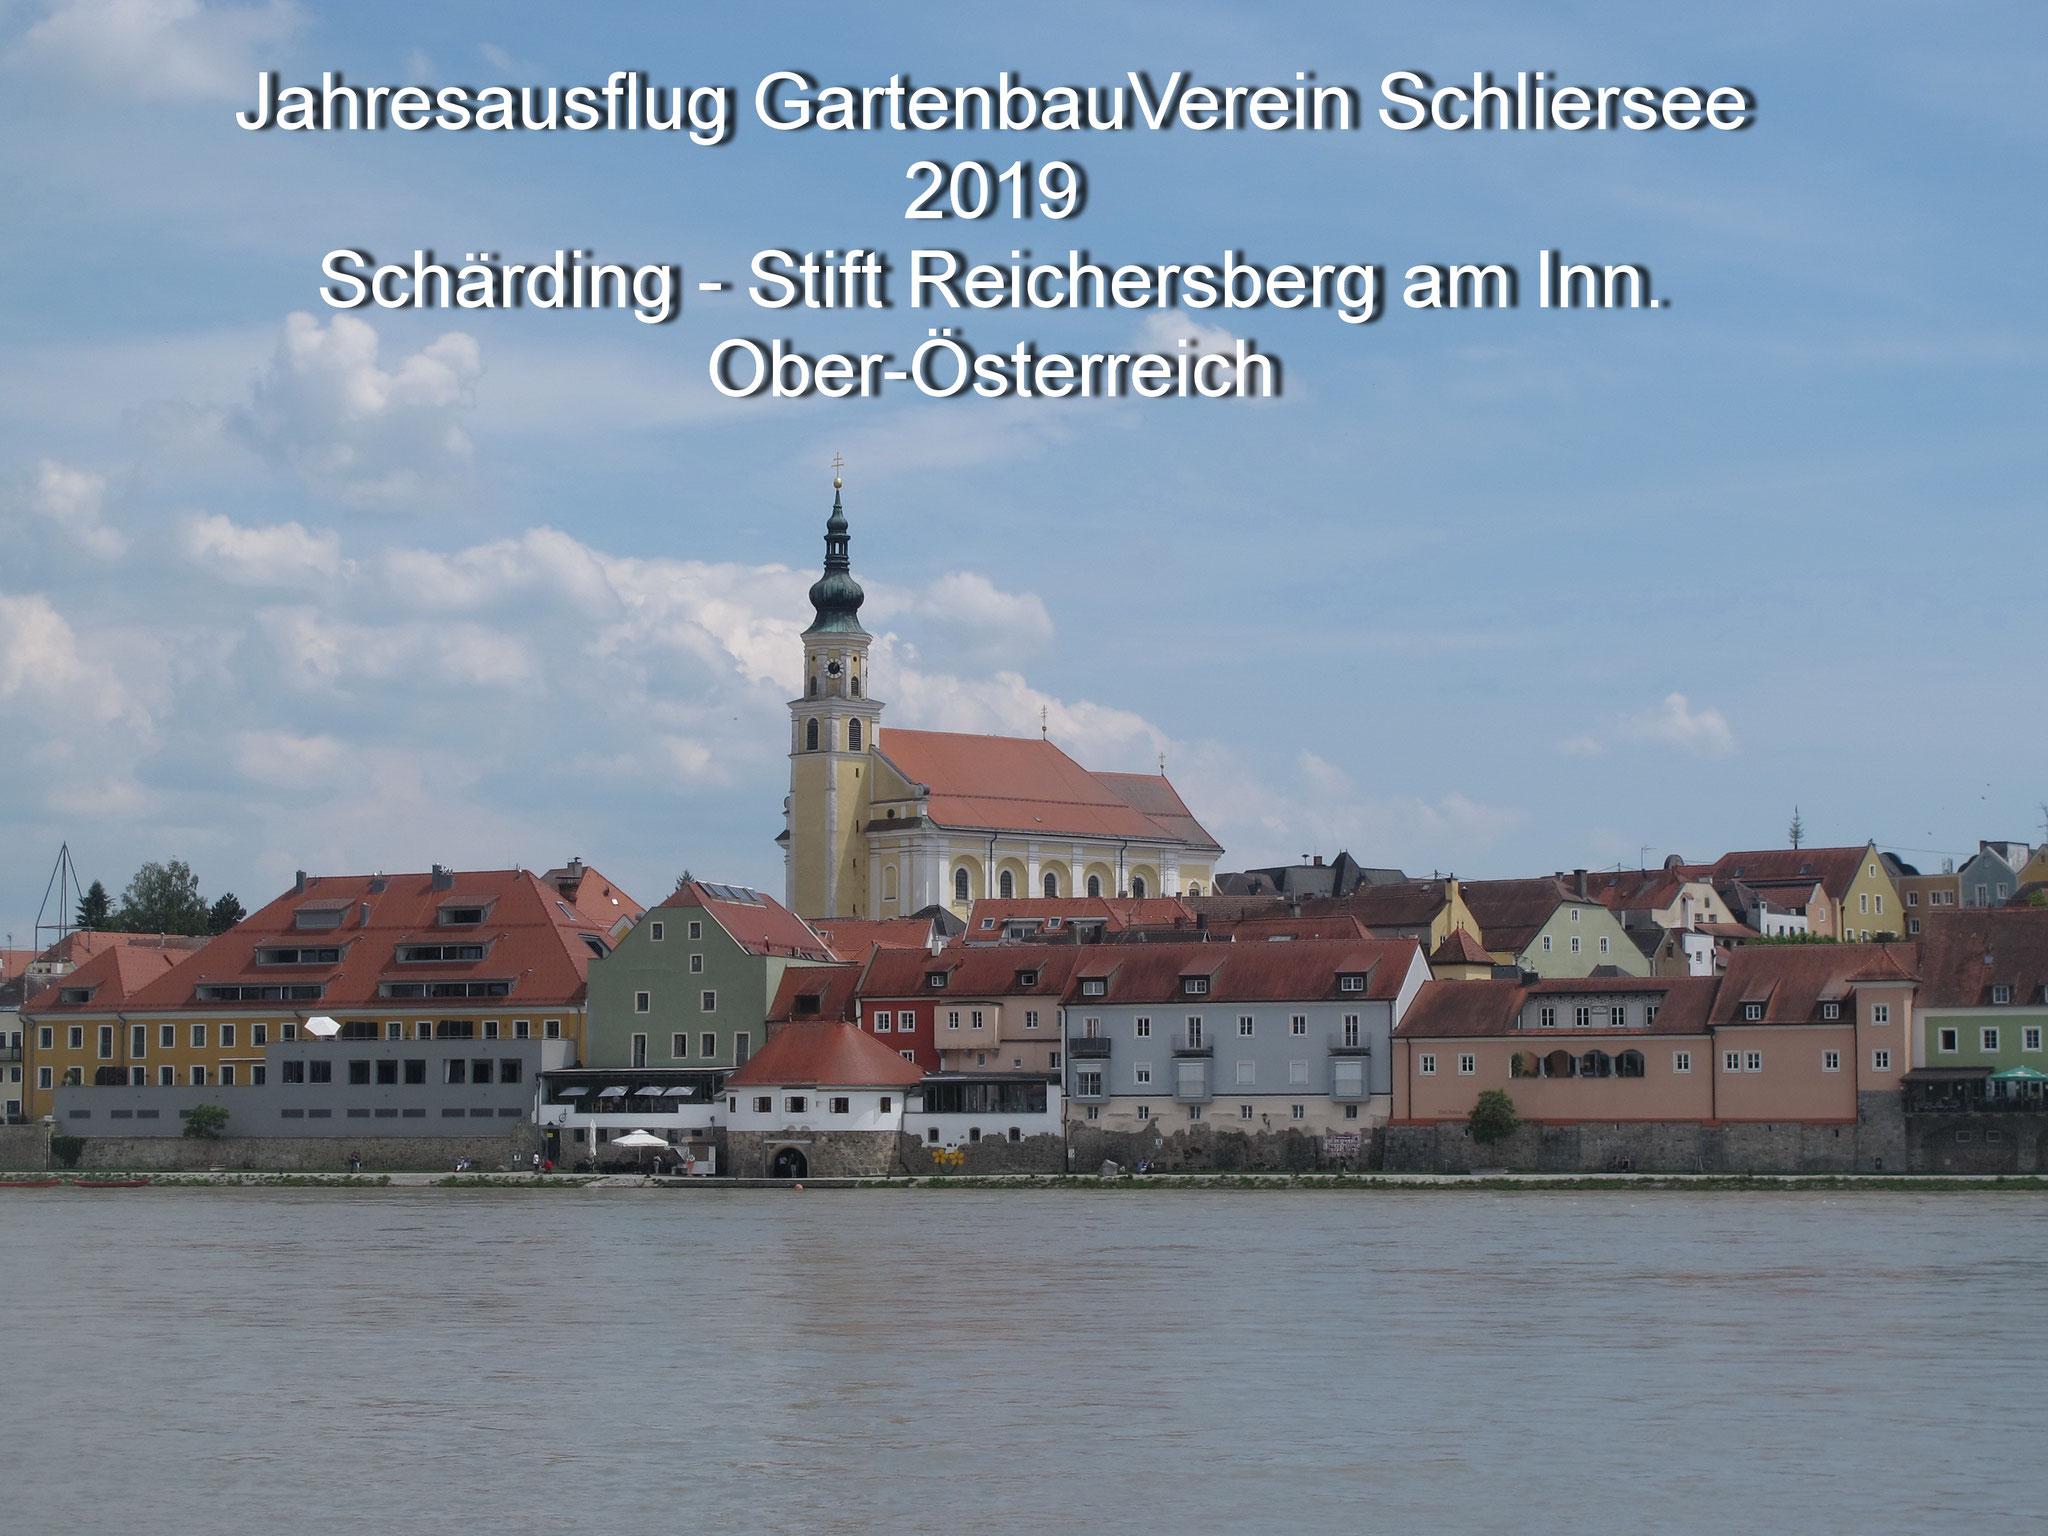 Schärding am Inn - Oberösterreich